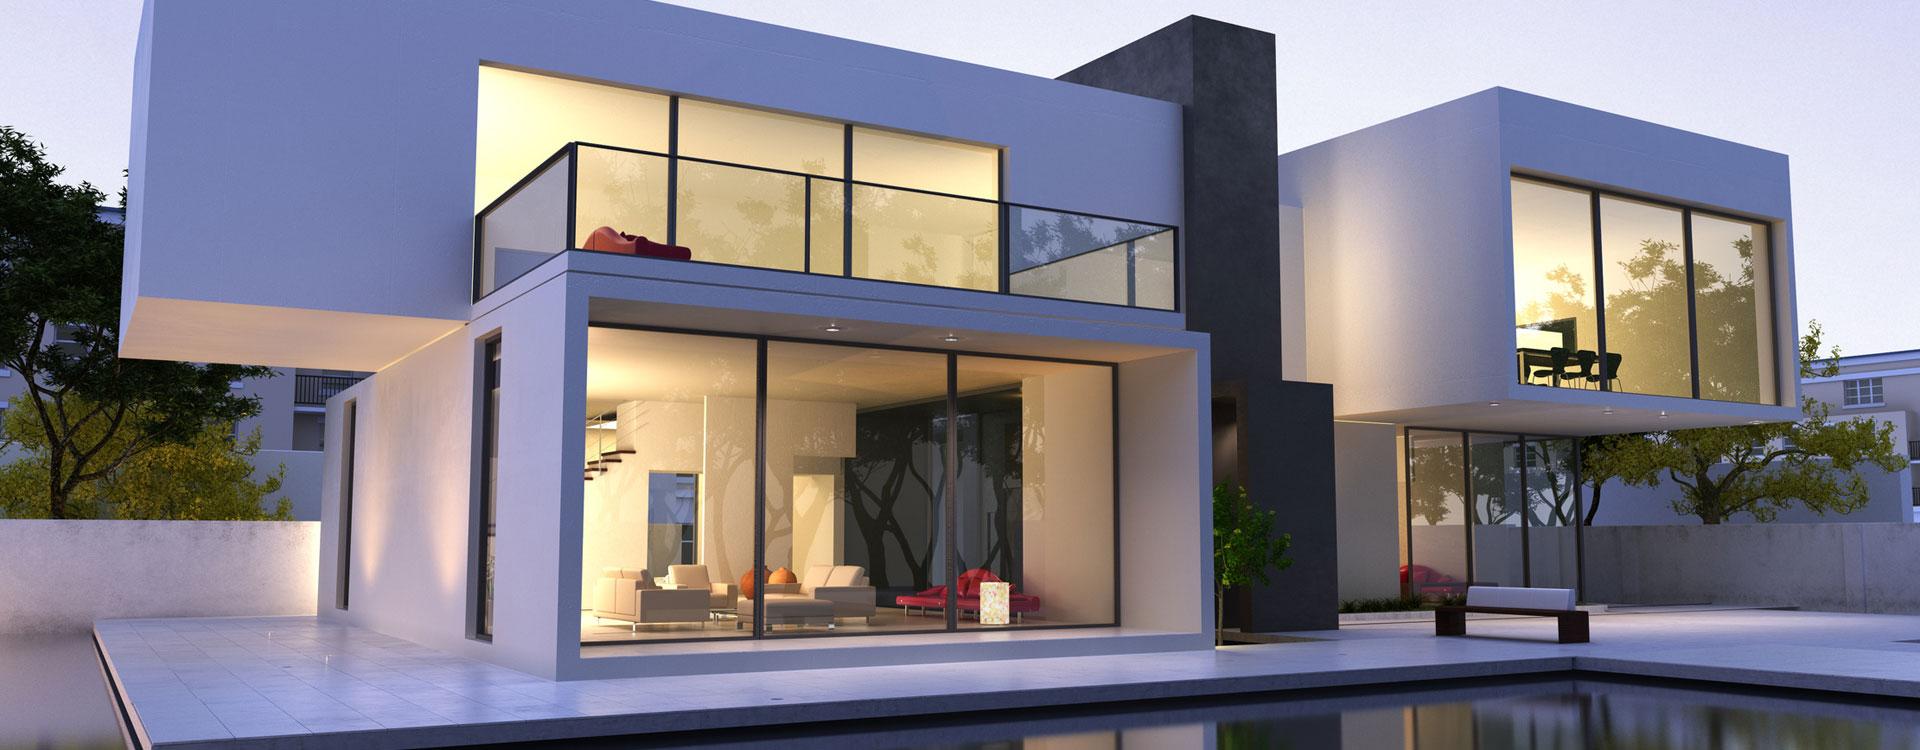 mc menuiseries menuisier certifi profils syst mes sur. Black Bedroom Furniture Sets. Home Design Ideas